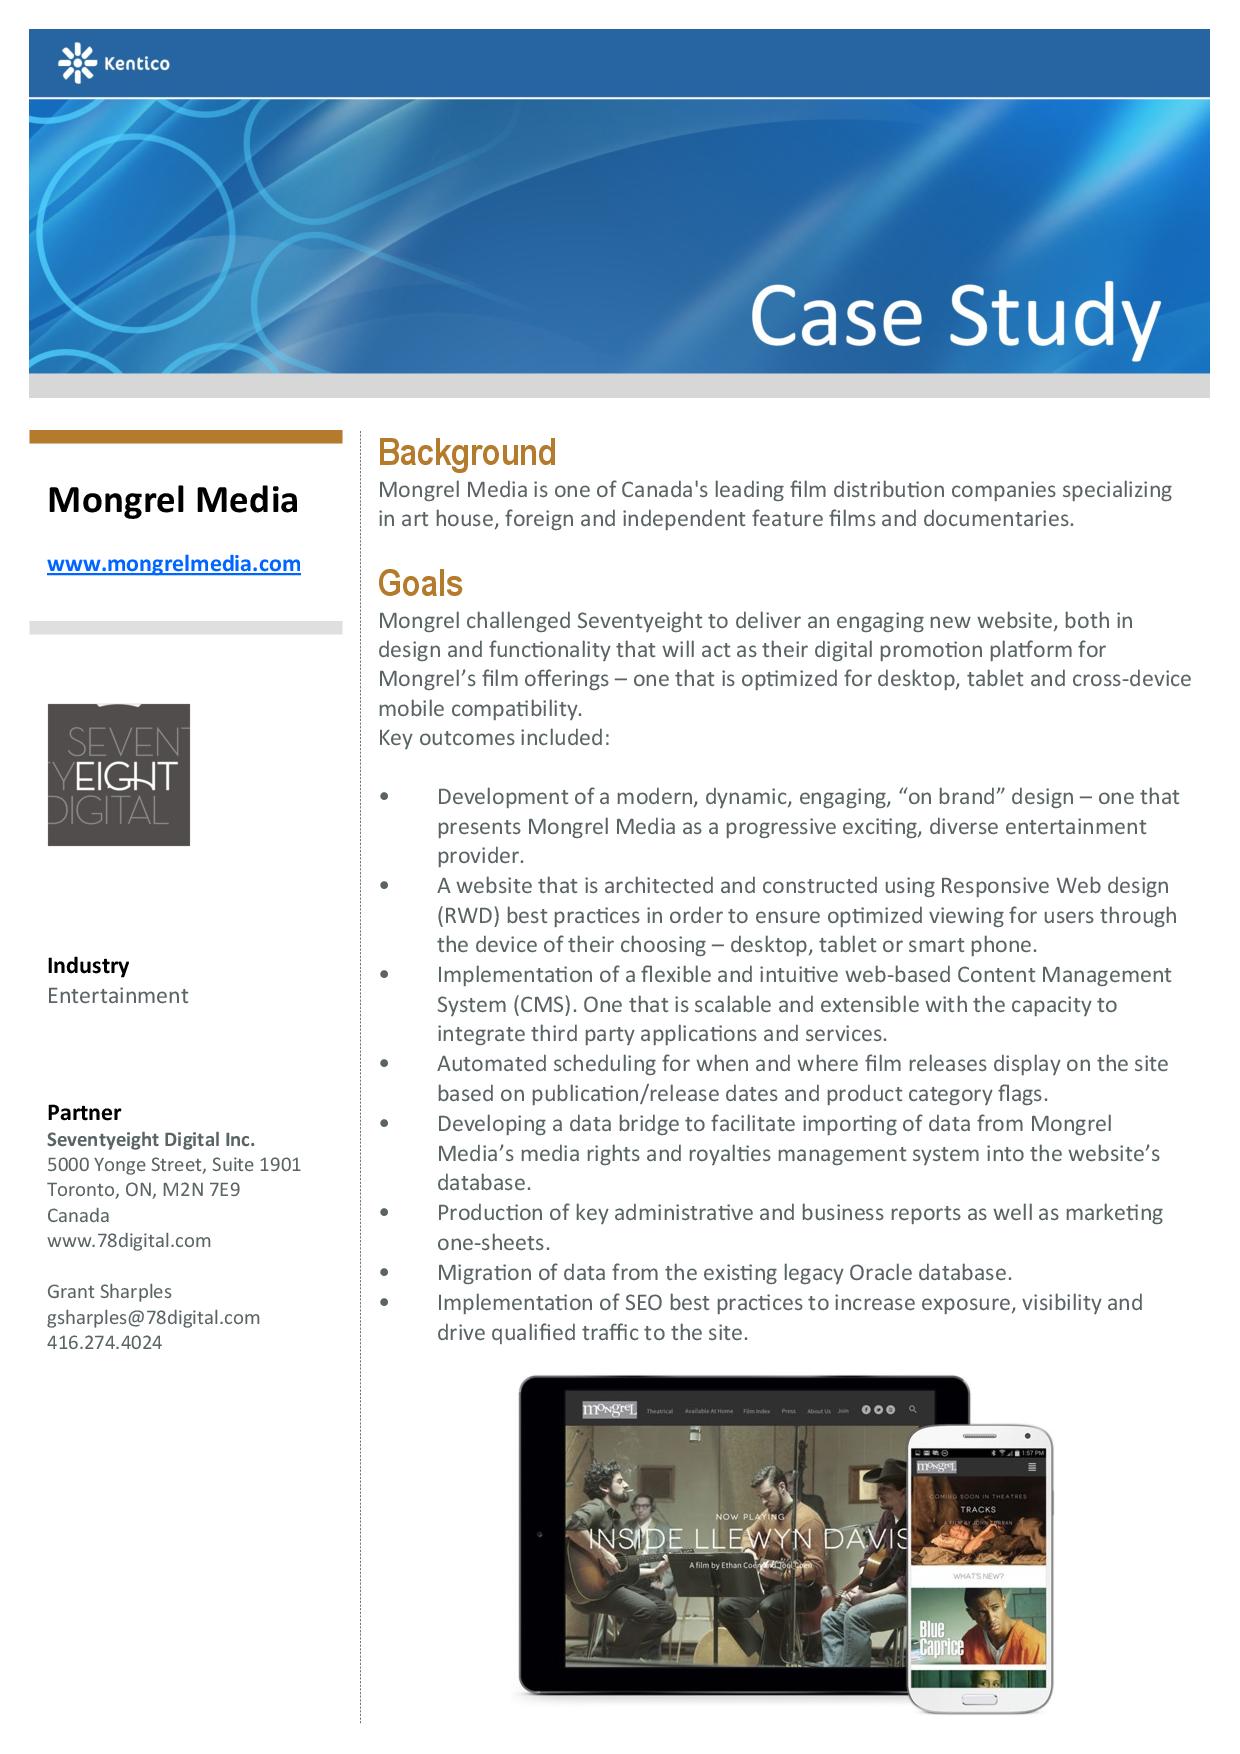 Mongrel Media